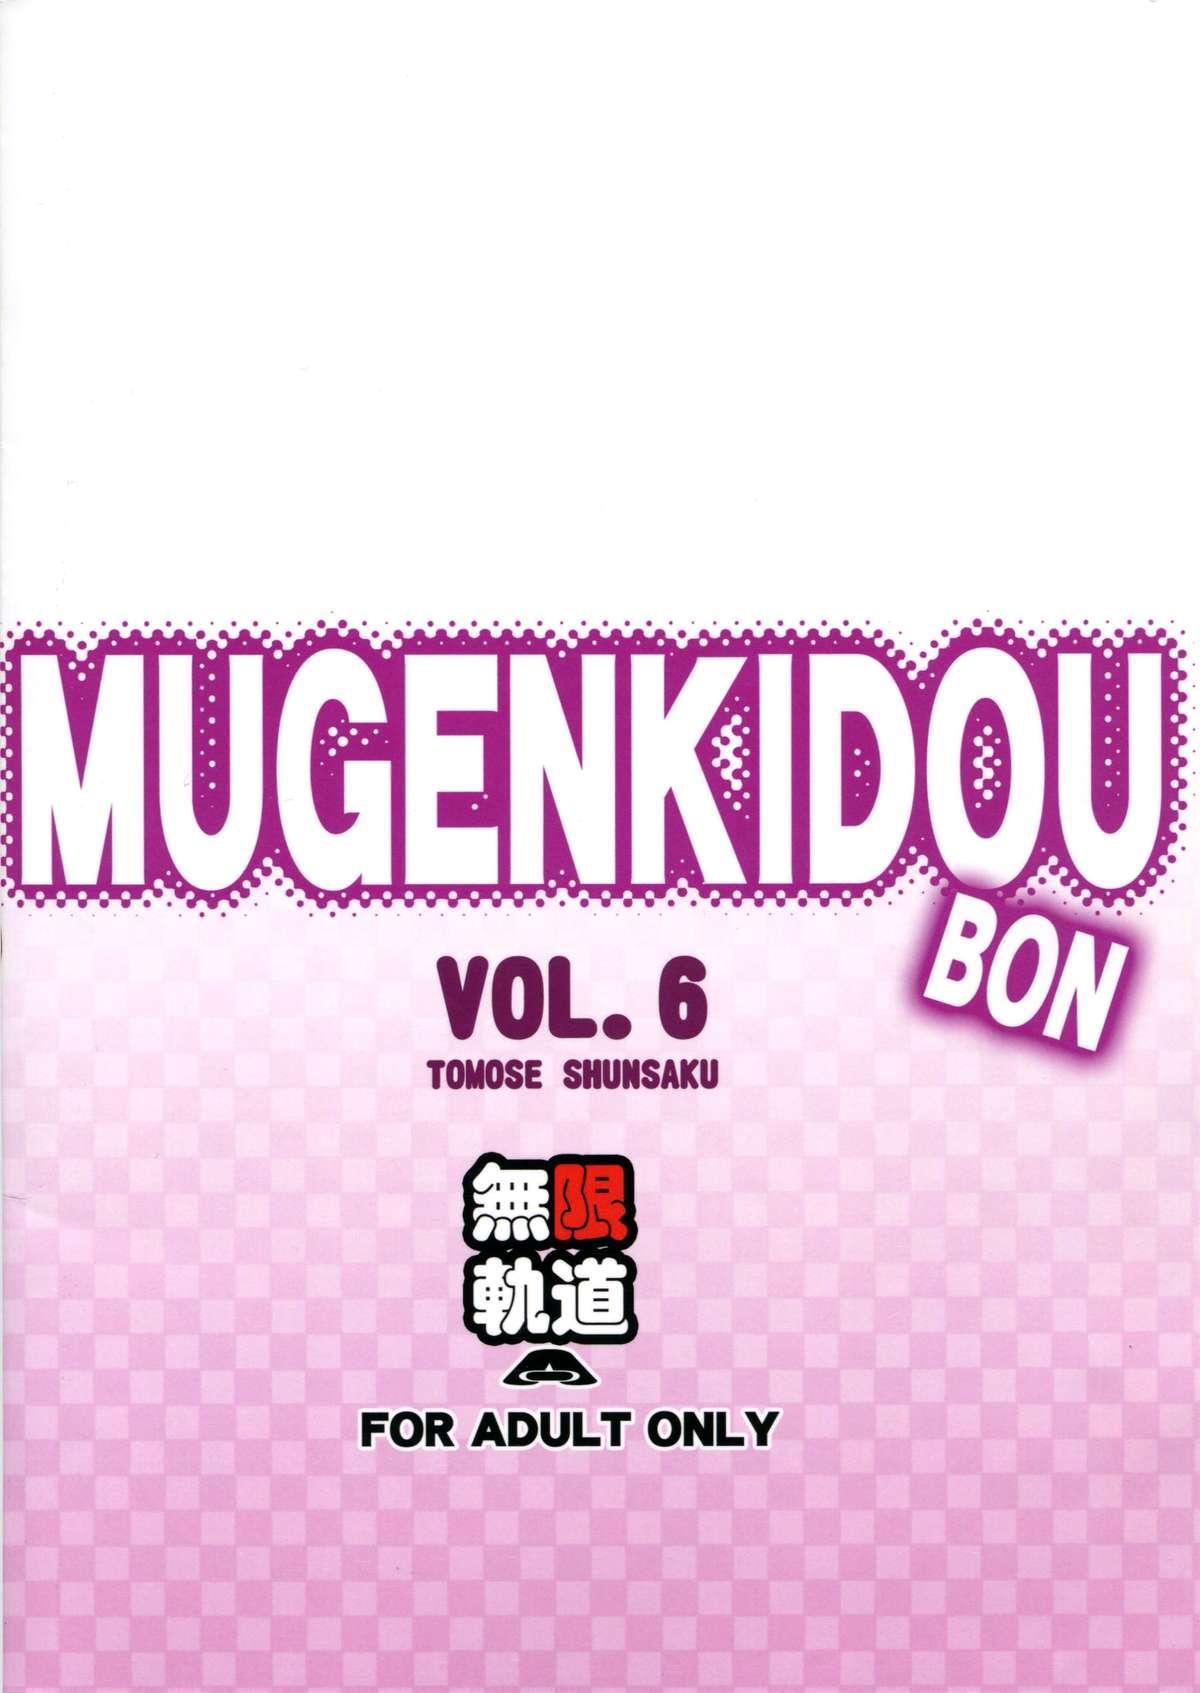 MUGENKIDOUBON! Vol. 6 13